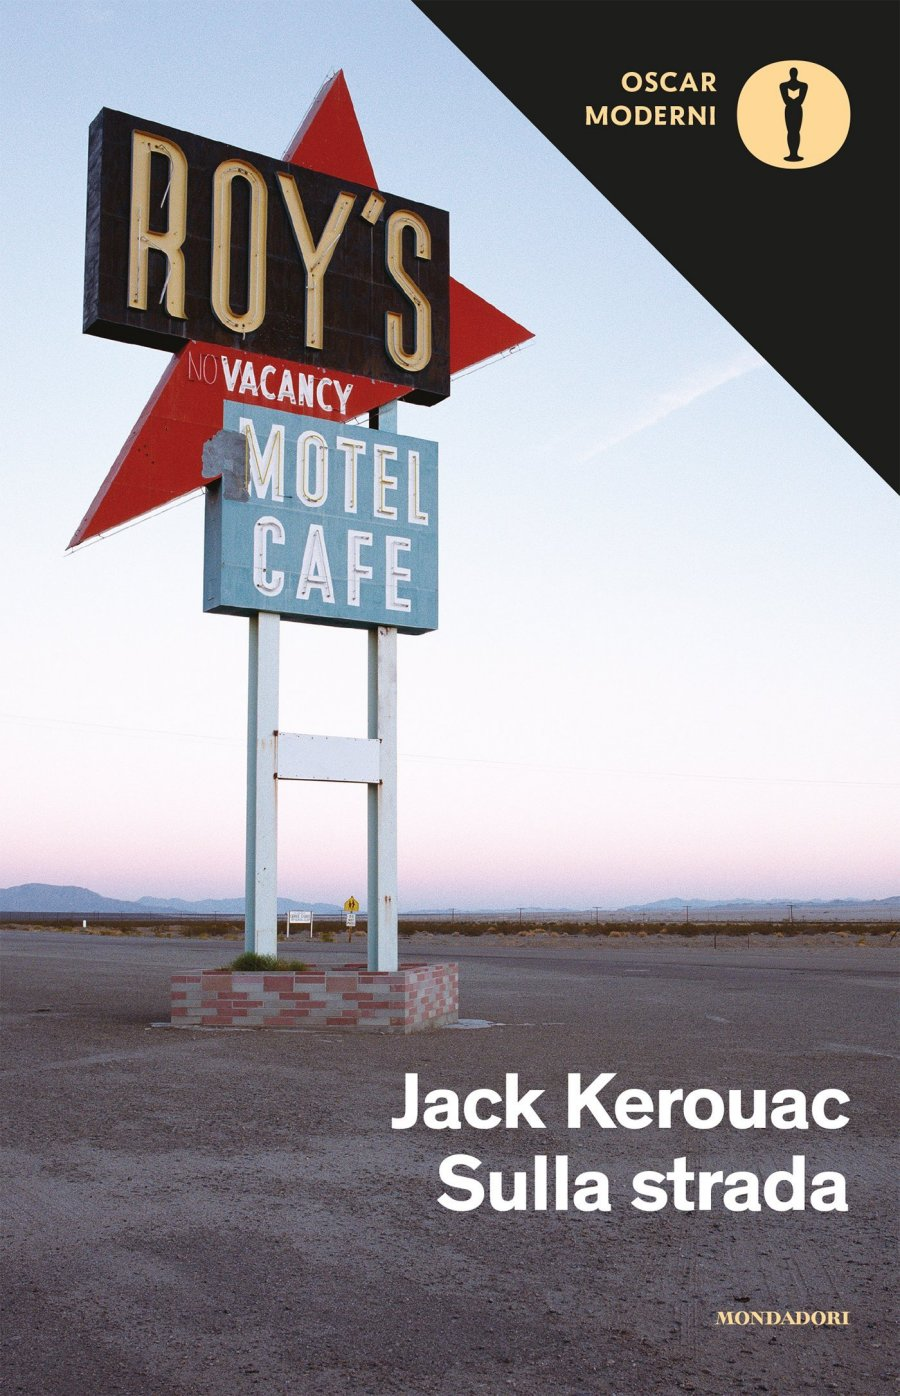 Jack Kerouac – On The Road